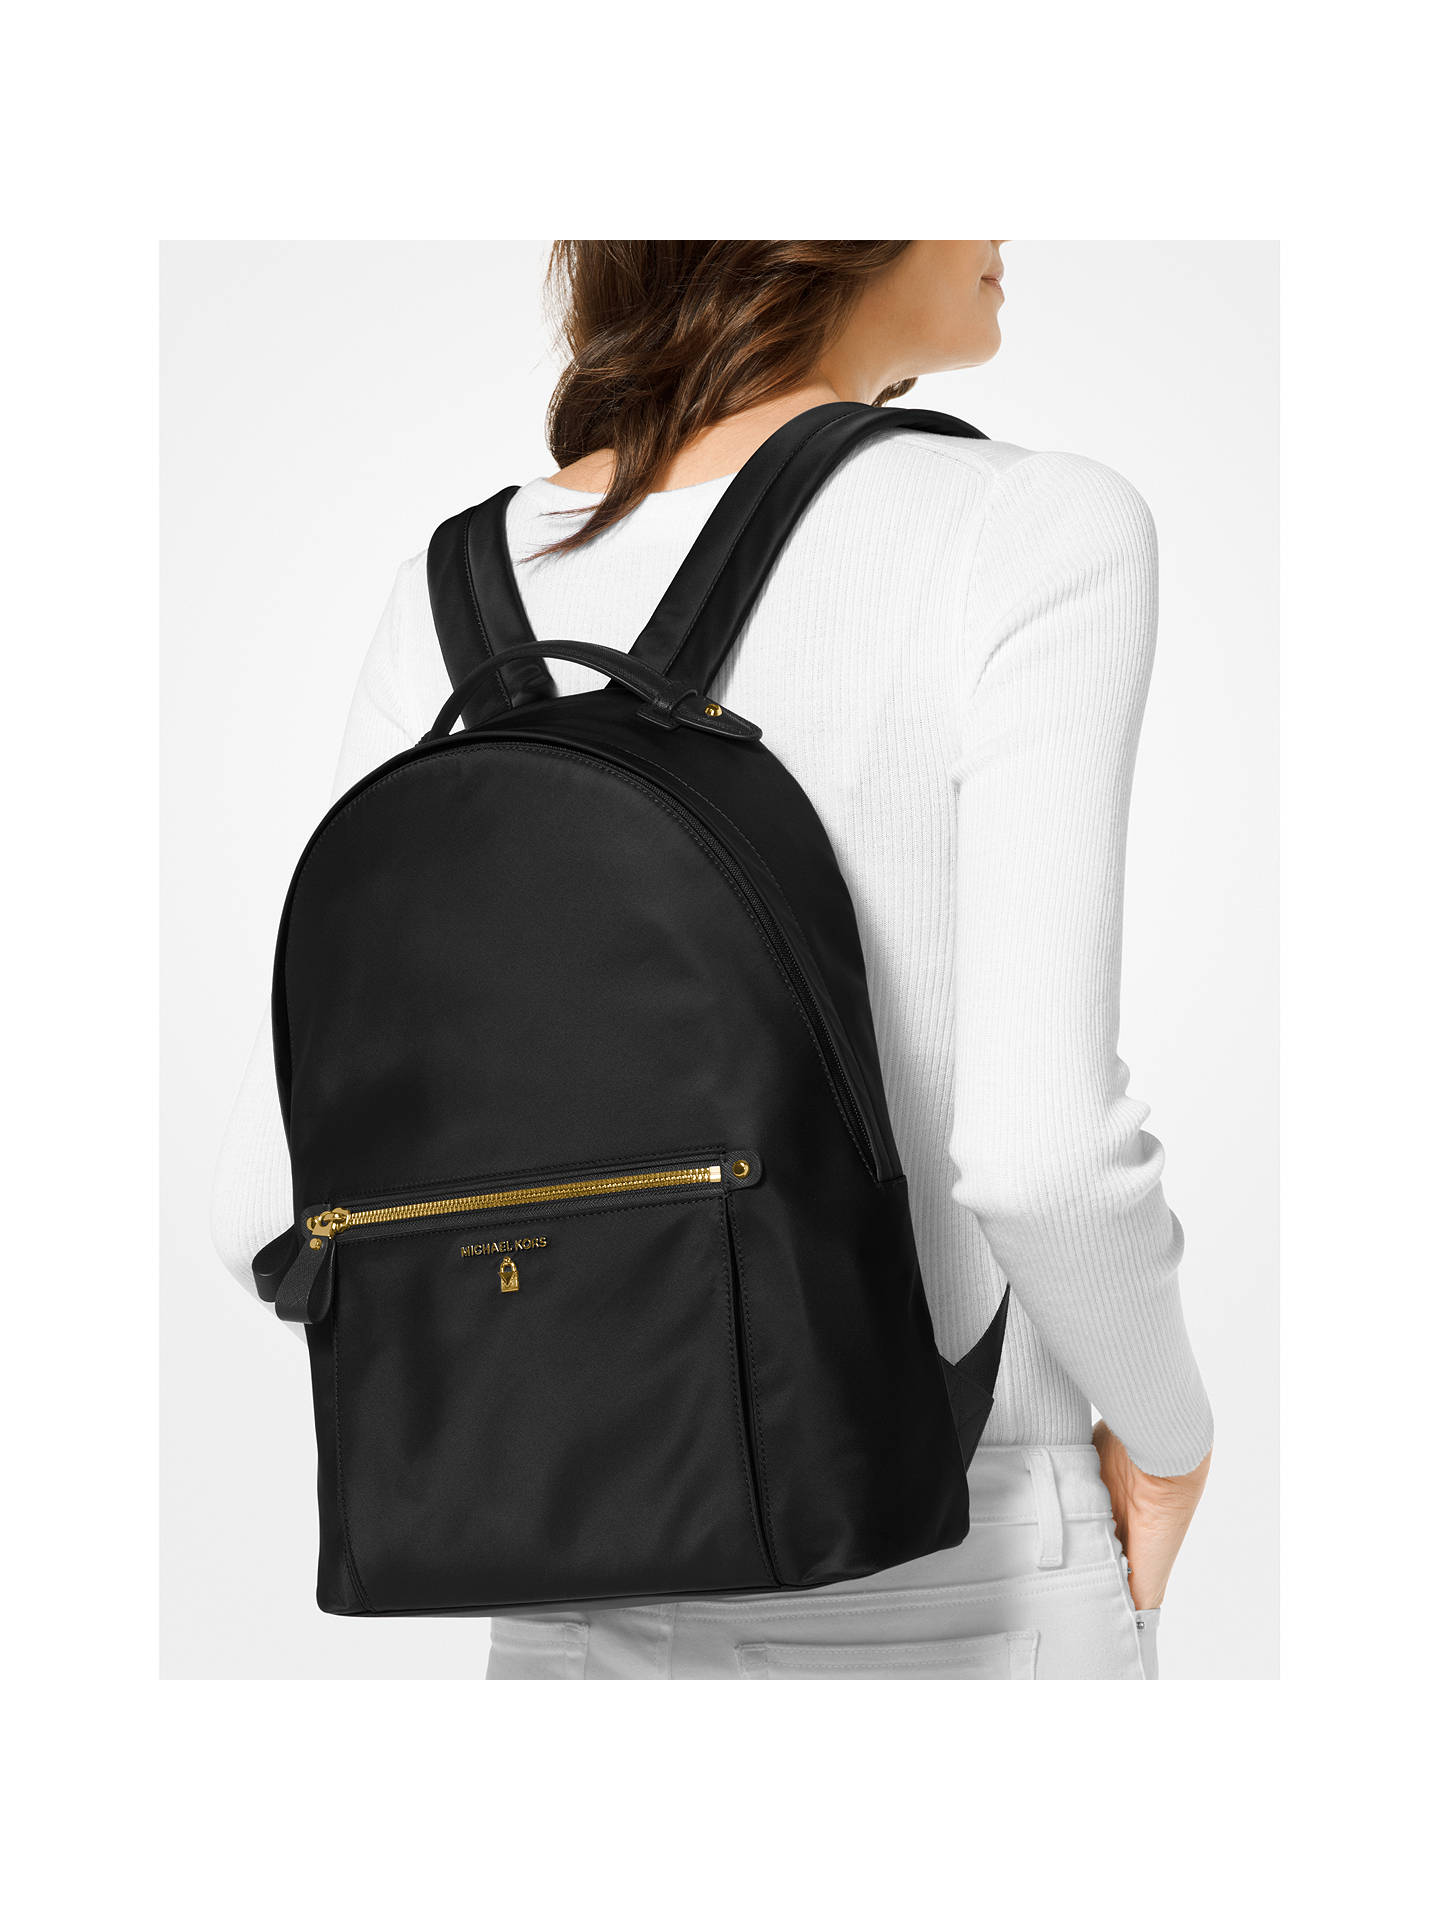 8fec1a8e36ea73 ... Buy MICHAEL Michael Kors Kelsey Backpack, Black Online at johnlewis.com  ...